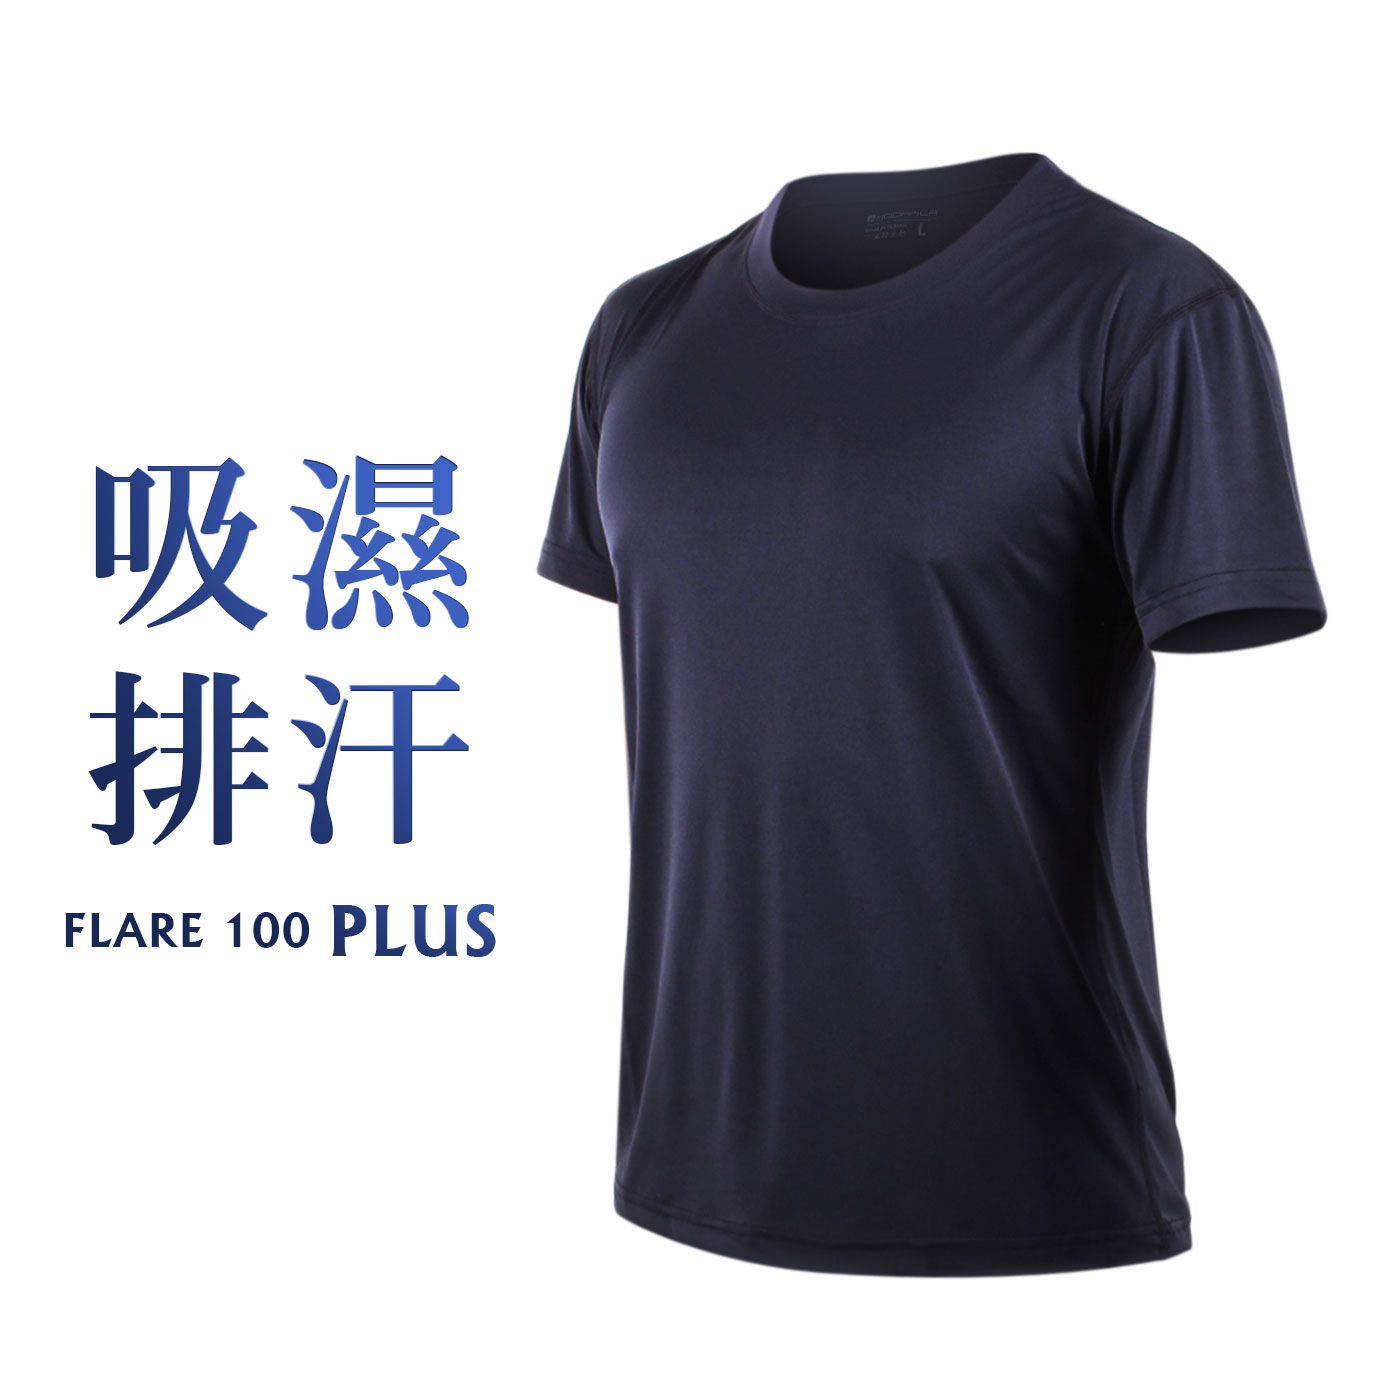 HODARLA FLARE 100 PLUS 吸濕排汗衫 3153701 - 丈青